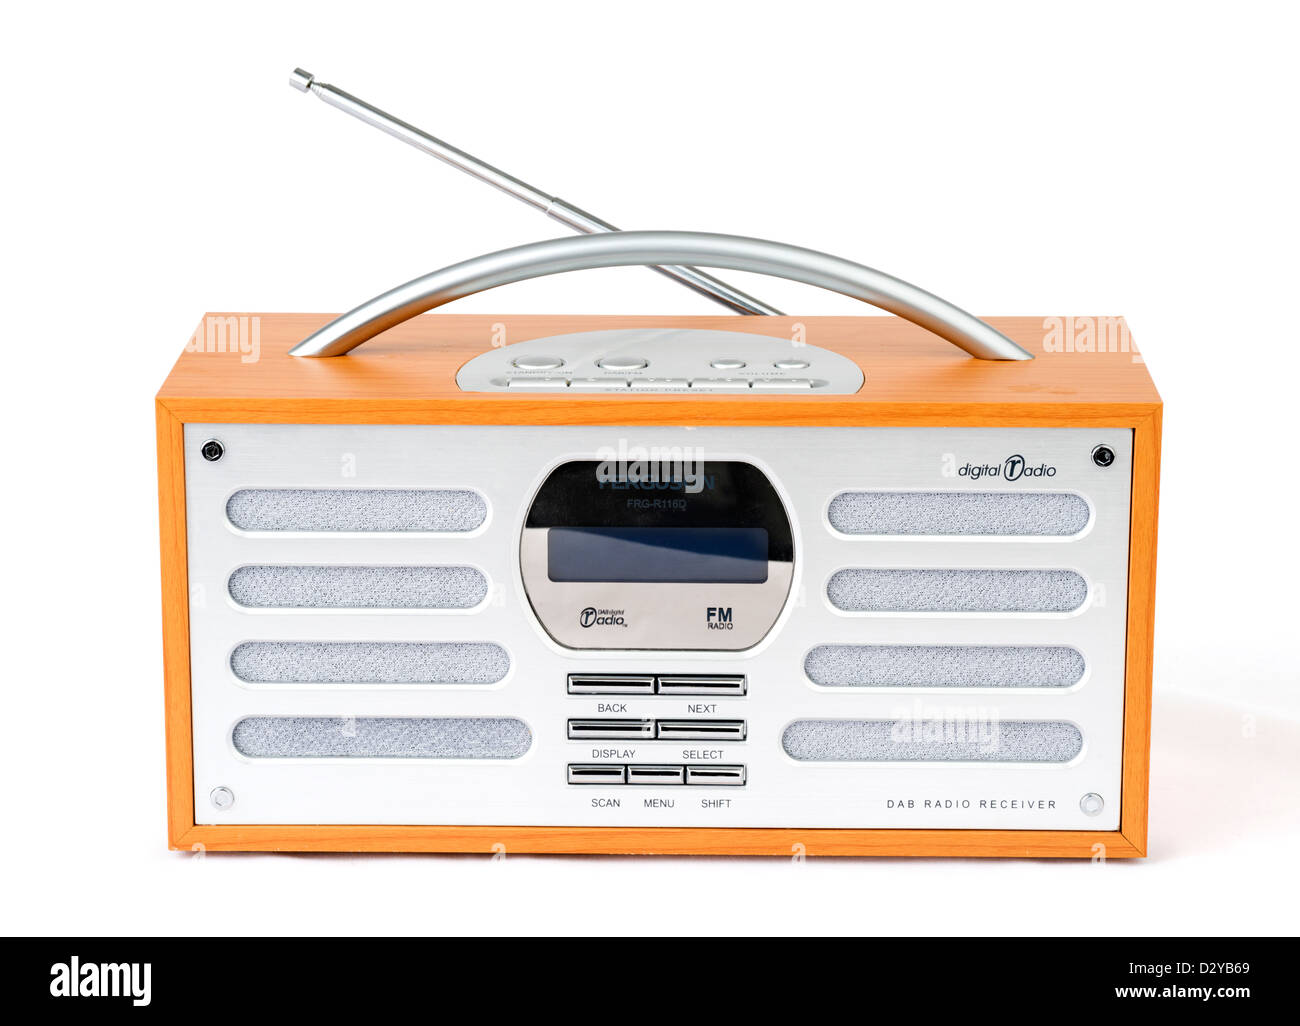 DAB digital radio, UK - Stock Image